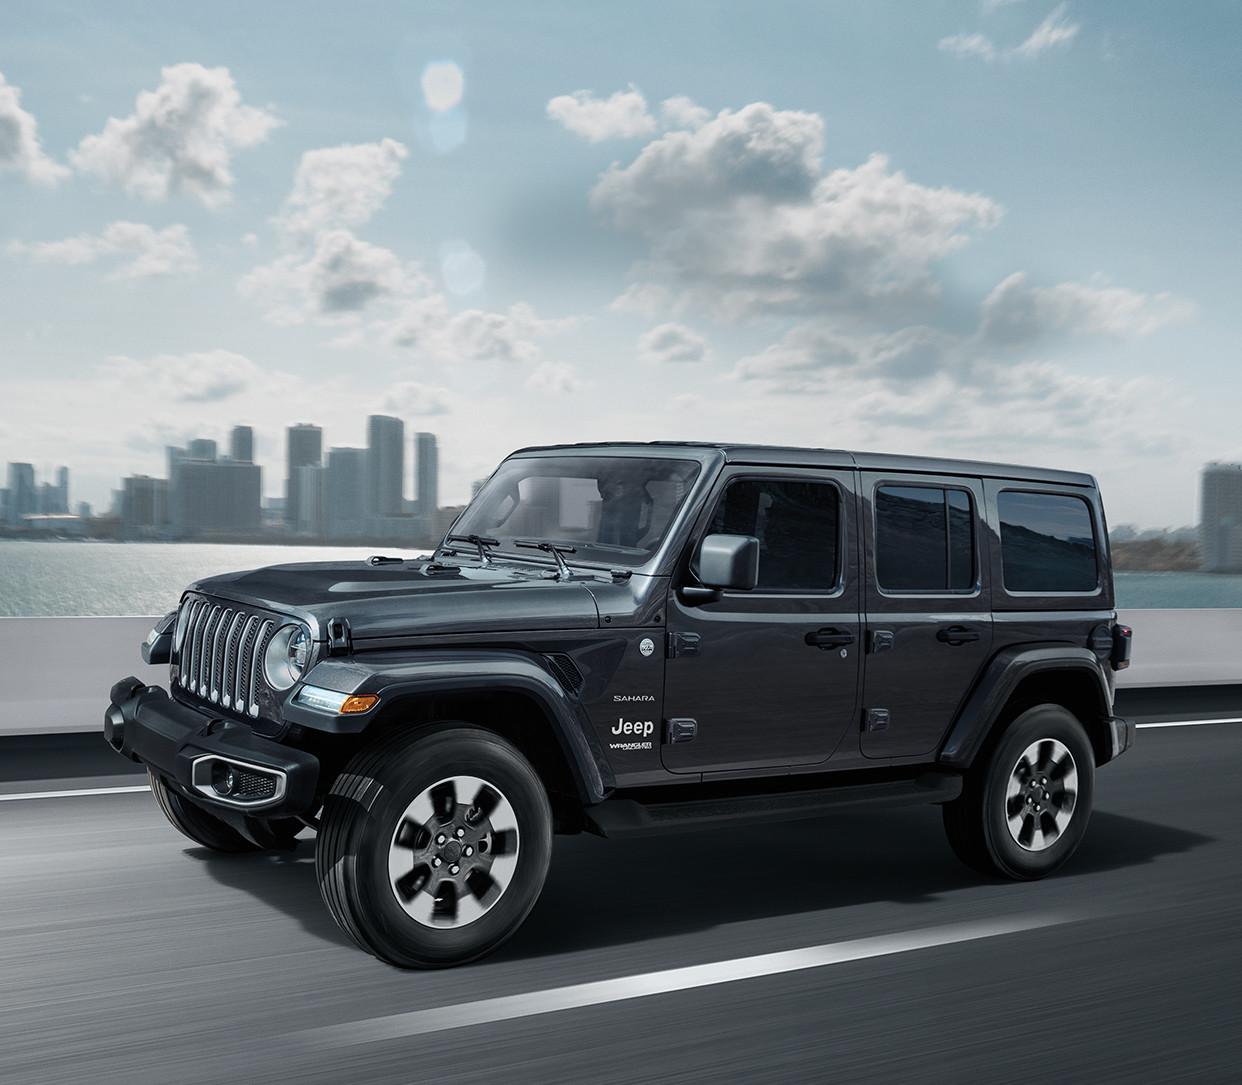 hight resolution of 2019 jeep wrangler on highway shown in dark grey